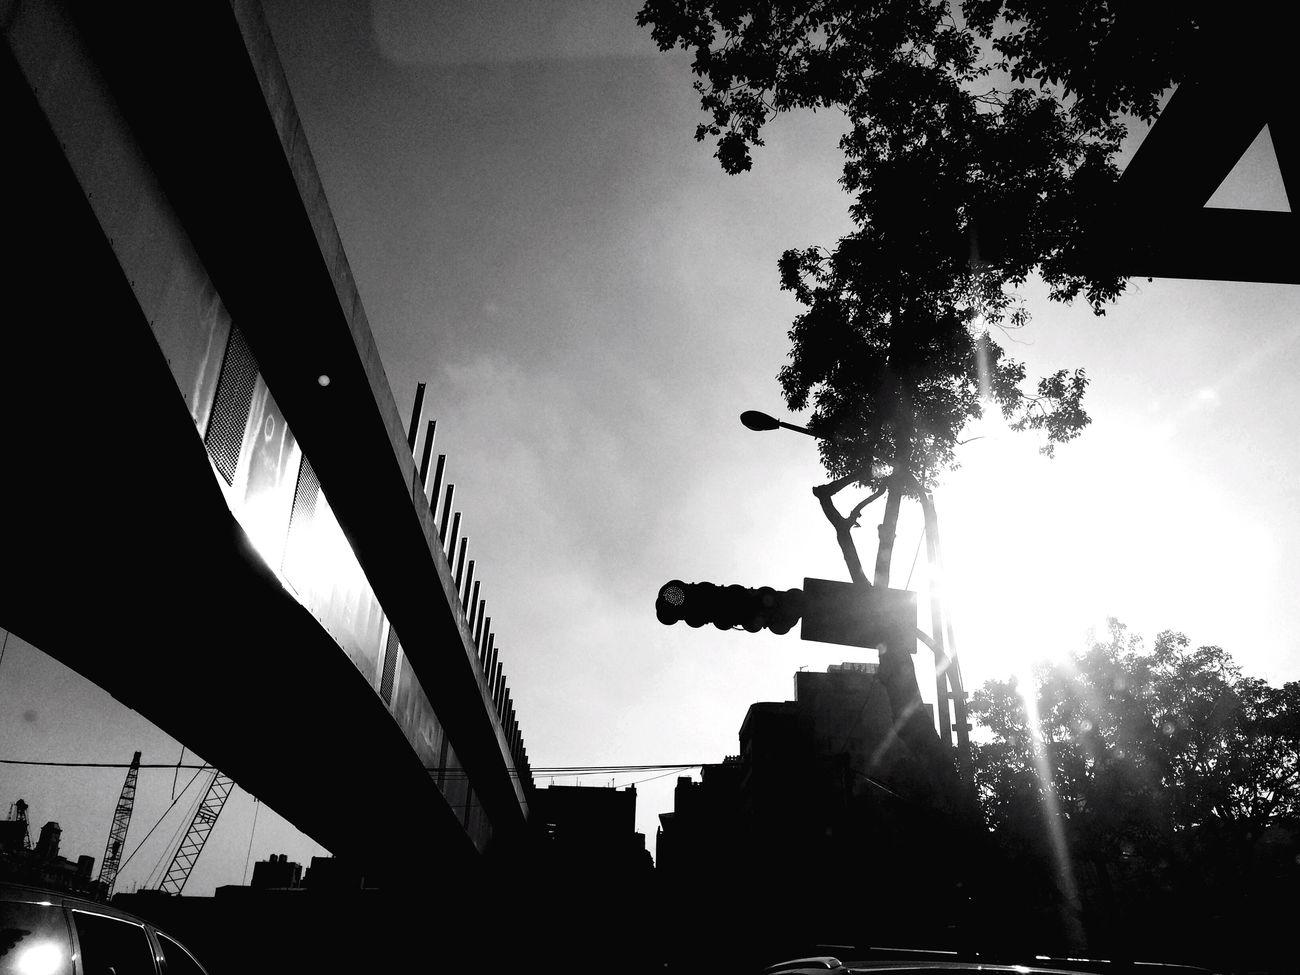 Sunlight Sky Sun Streetphotography Black And White Light And Shadow Taking Photos Enjoying Life Streetphoto_bw Eye4photography  Life EyeEm Best Shots - Black + White Street Photography Taichung Lifestyles